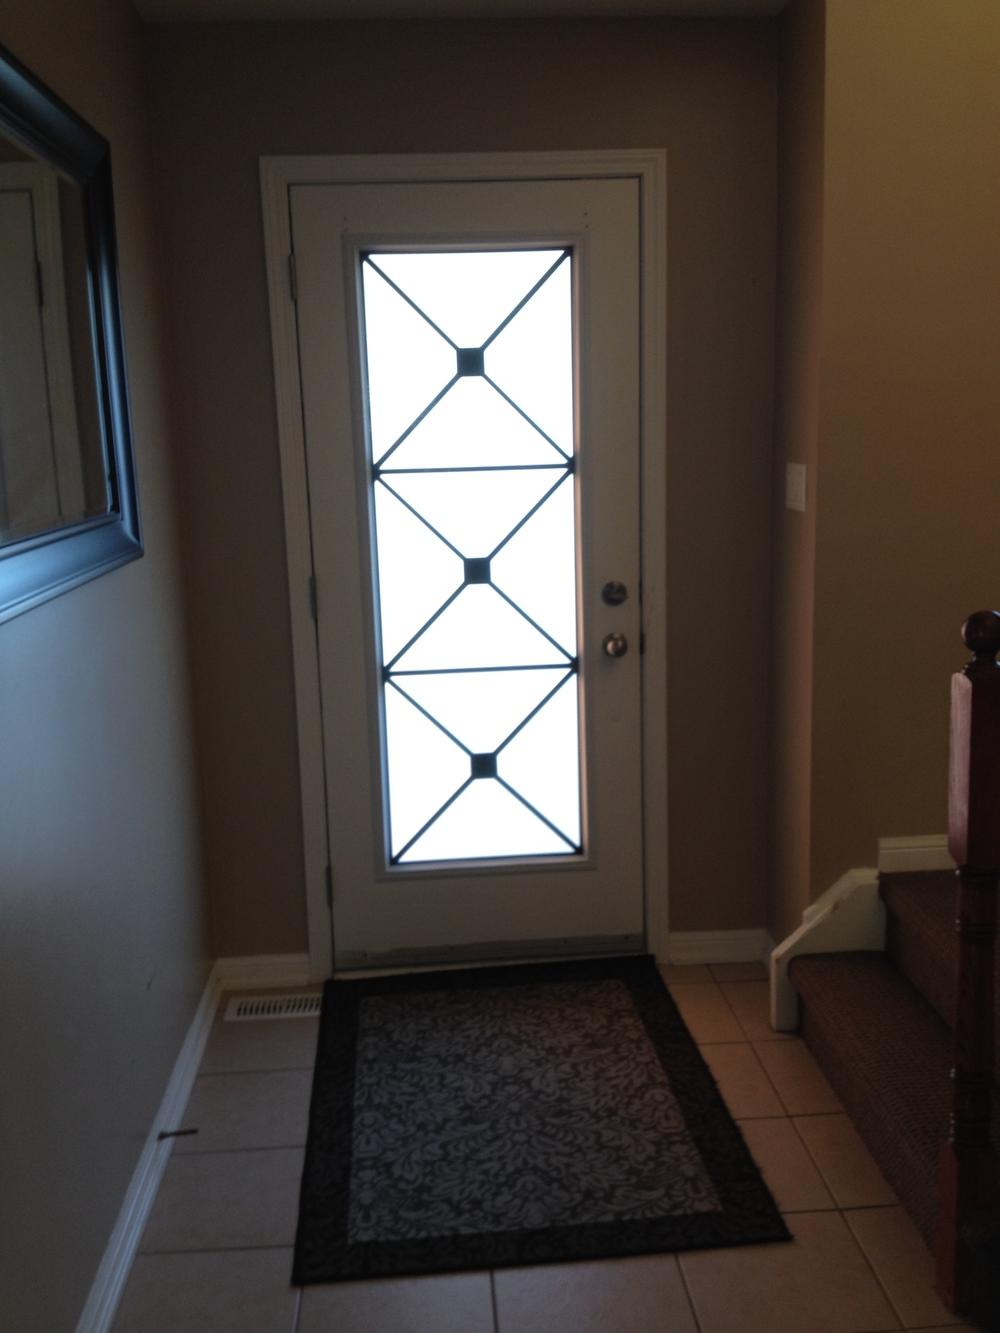 x-design-wrought-iron-glass-door-inserts-installtion